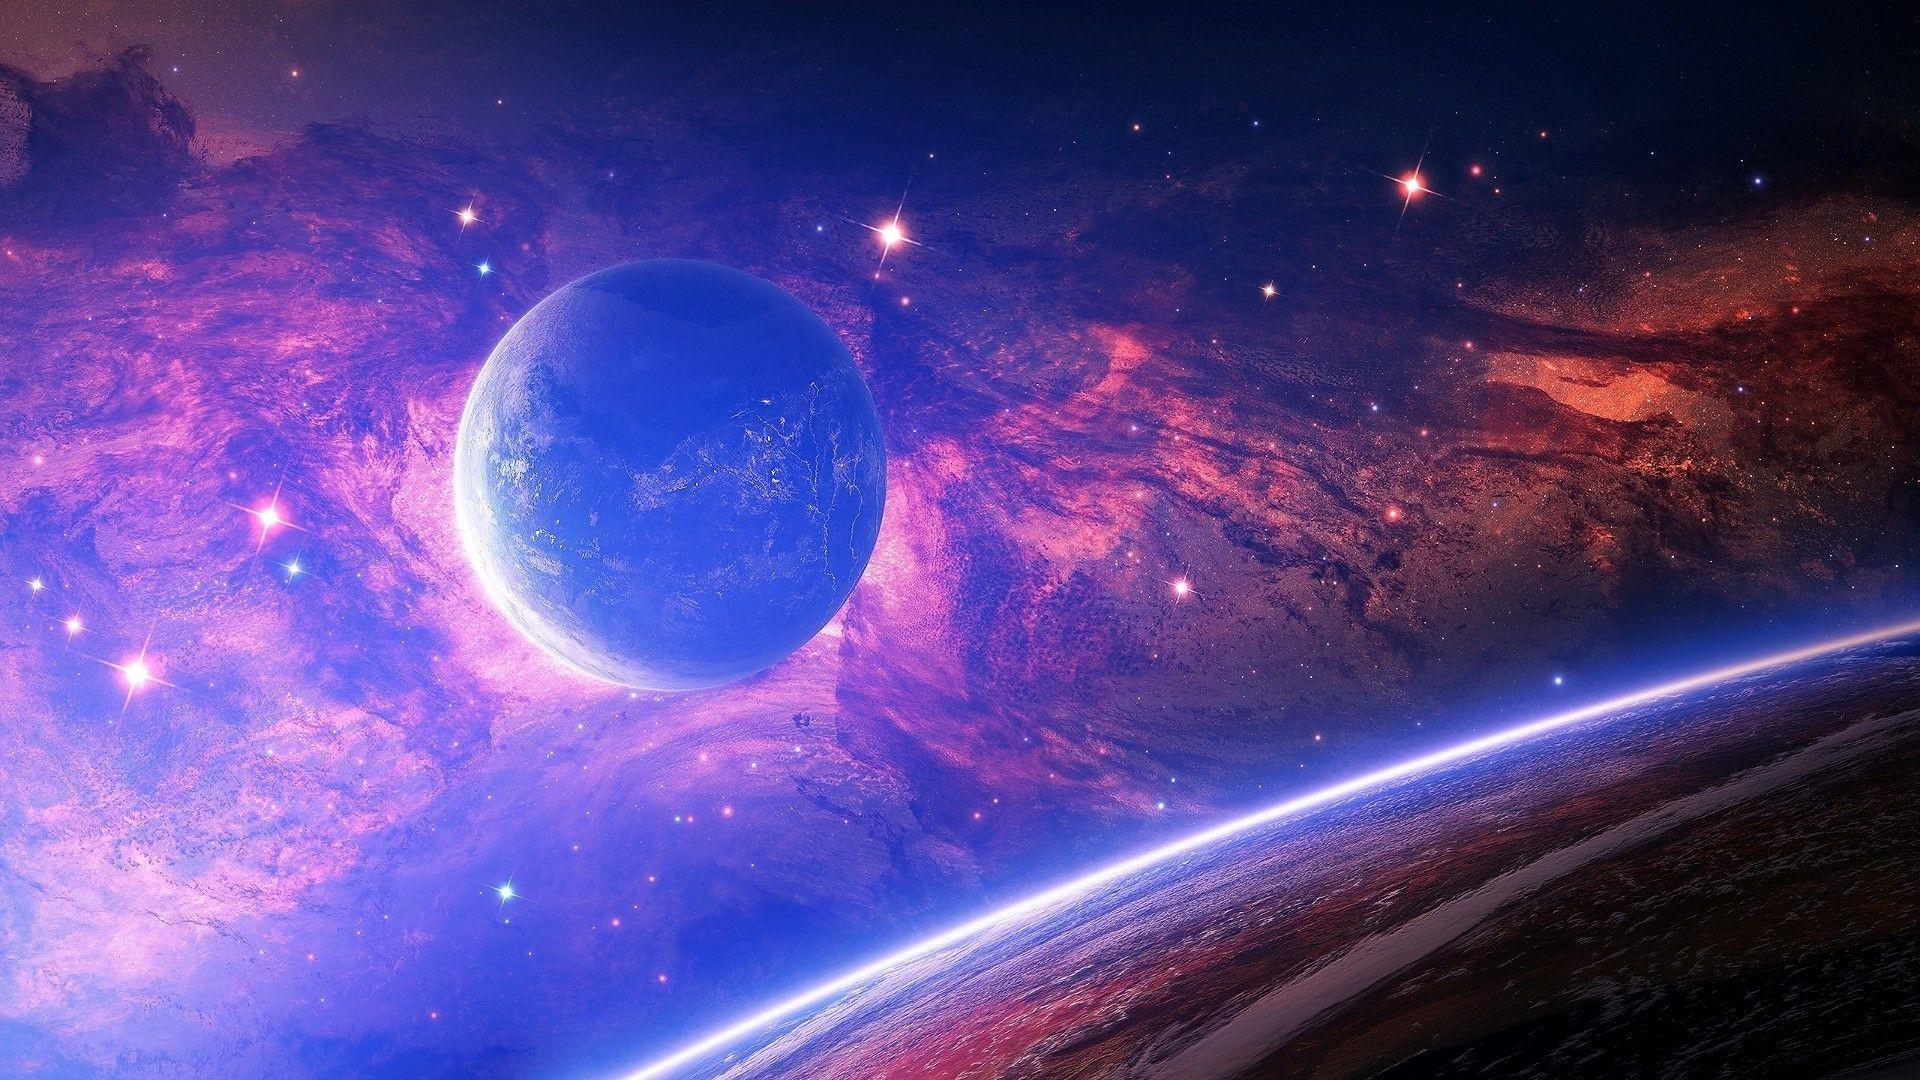 1280×720 Space purple nebula 1 Wallpaper